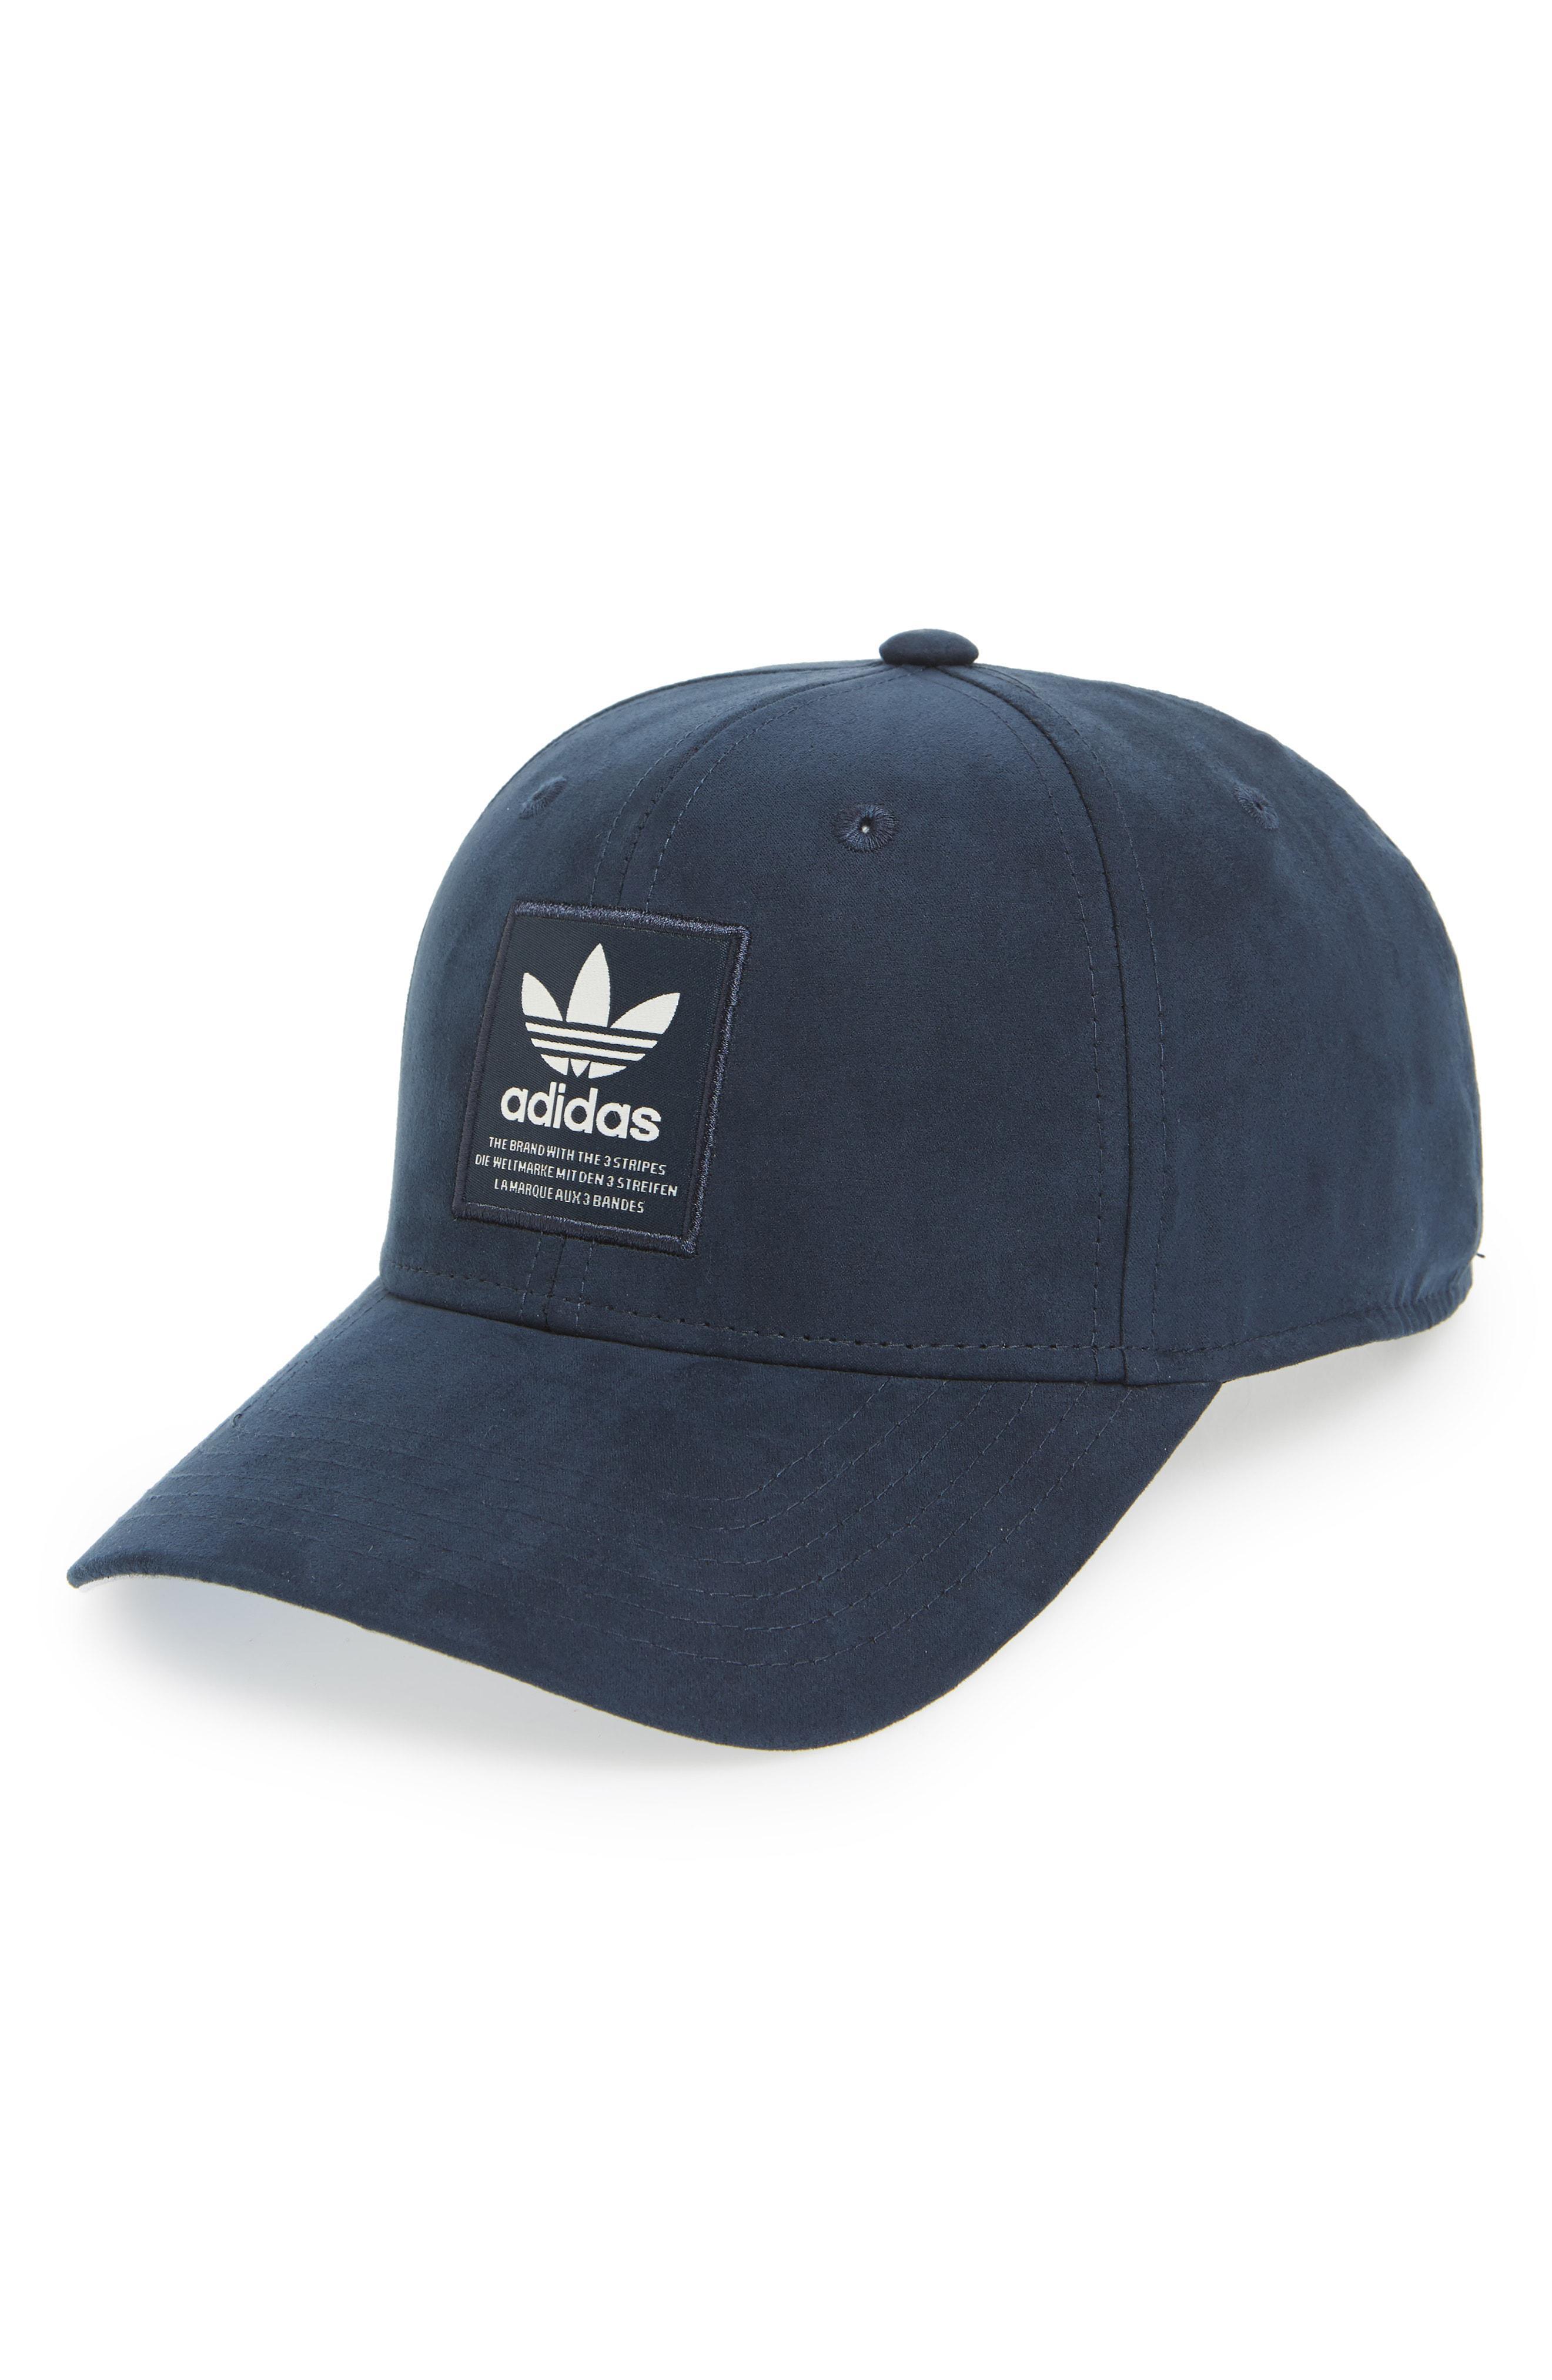 857aab90253 Lyst - Adidas Originals Trefoil Snapback Baseball Cap in Blue for Men